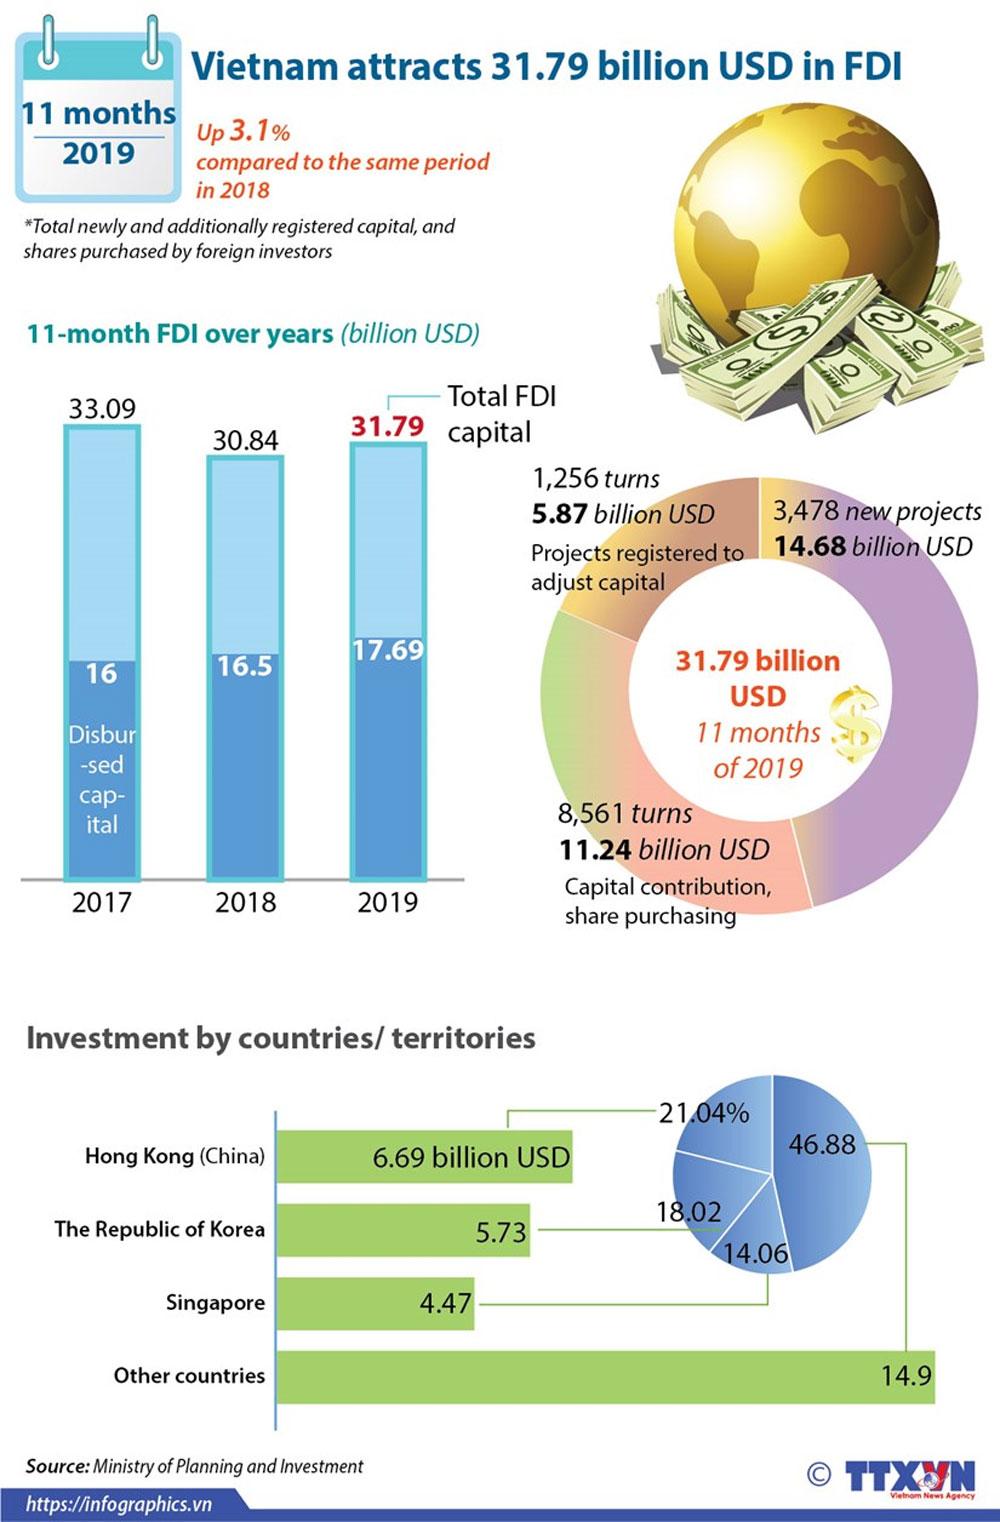 Vietnam, FDI, foreign direct investment, economic development